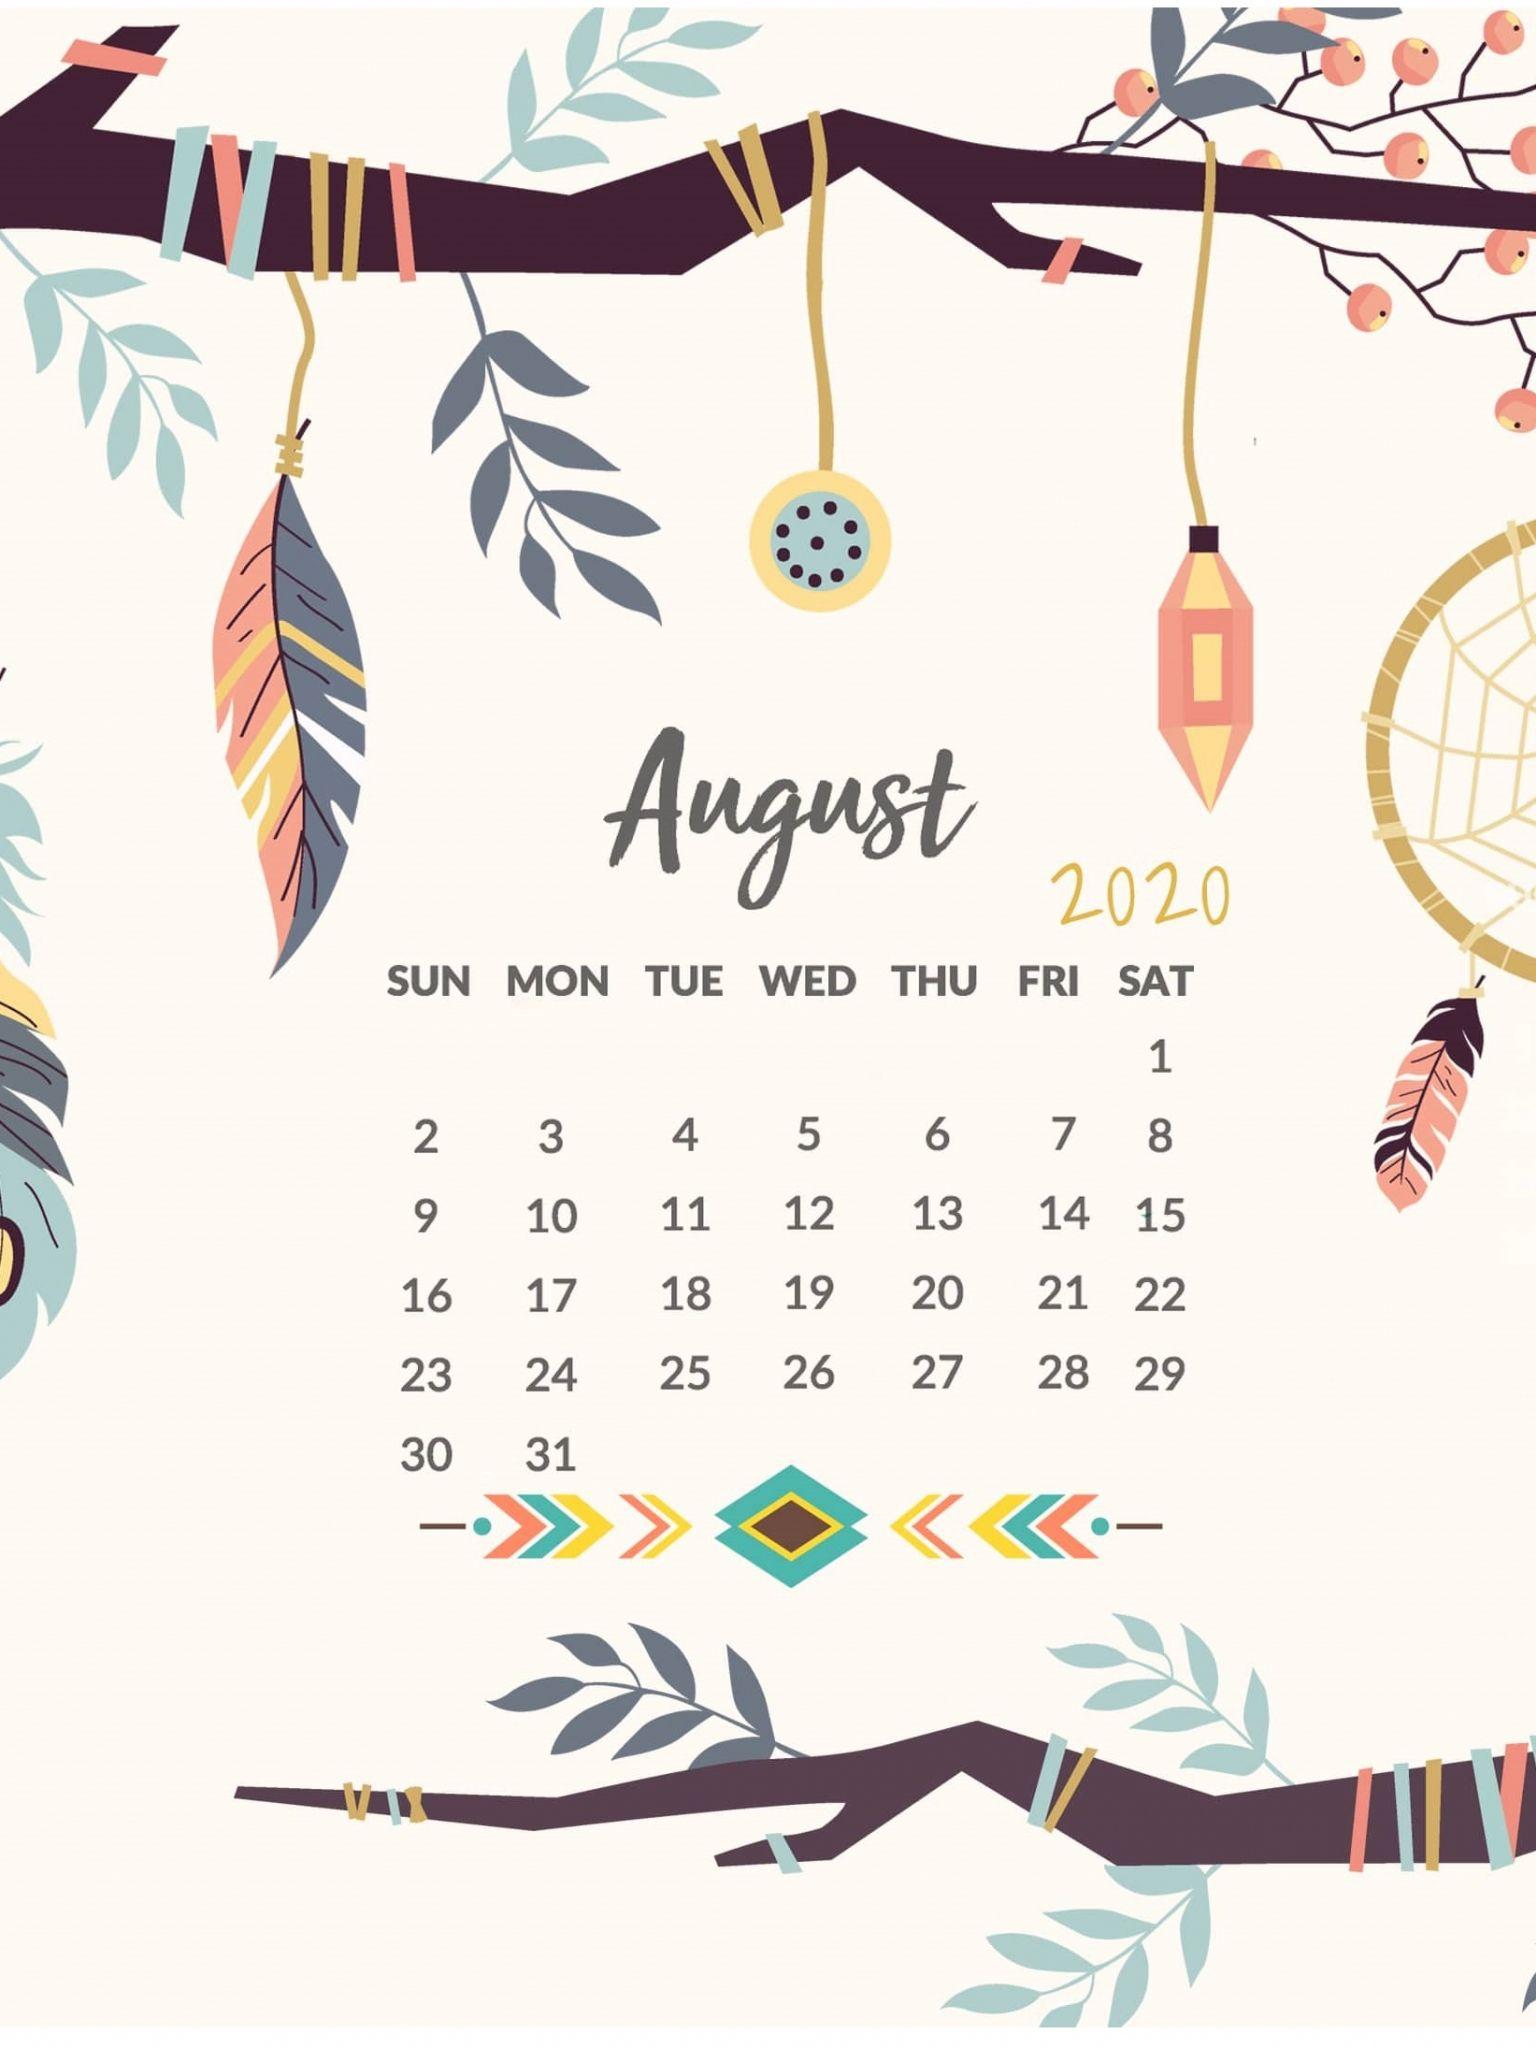 Free Printable August 2020 Desktop Calendar Wallpaper In 2020